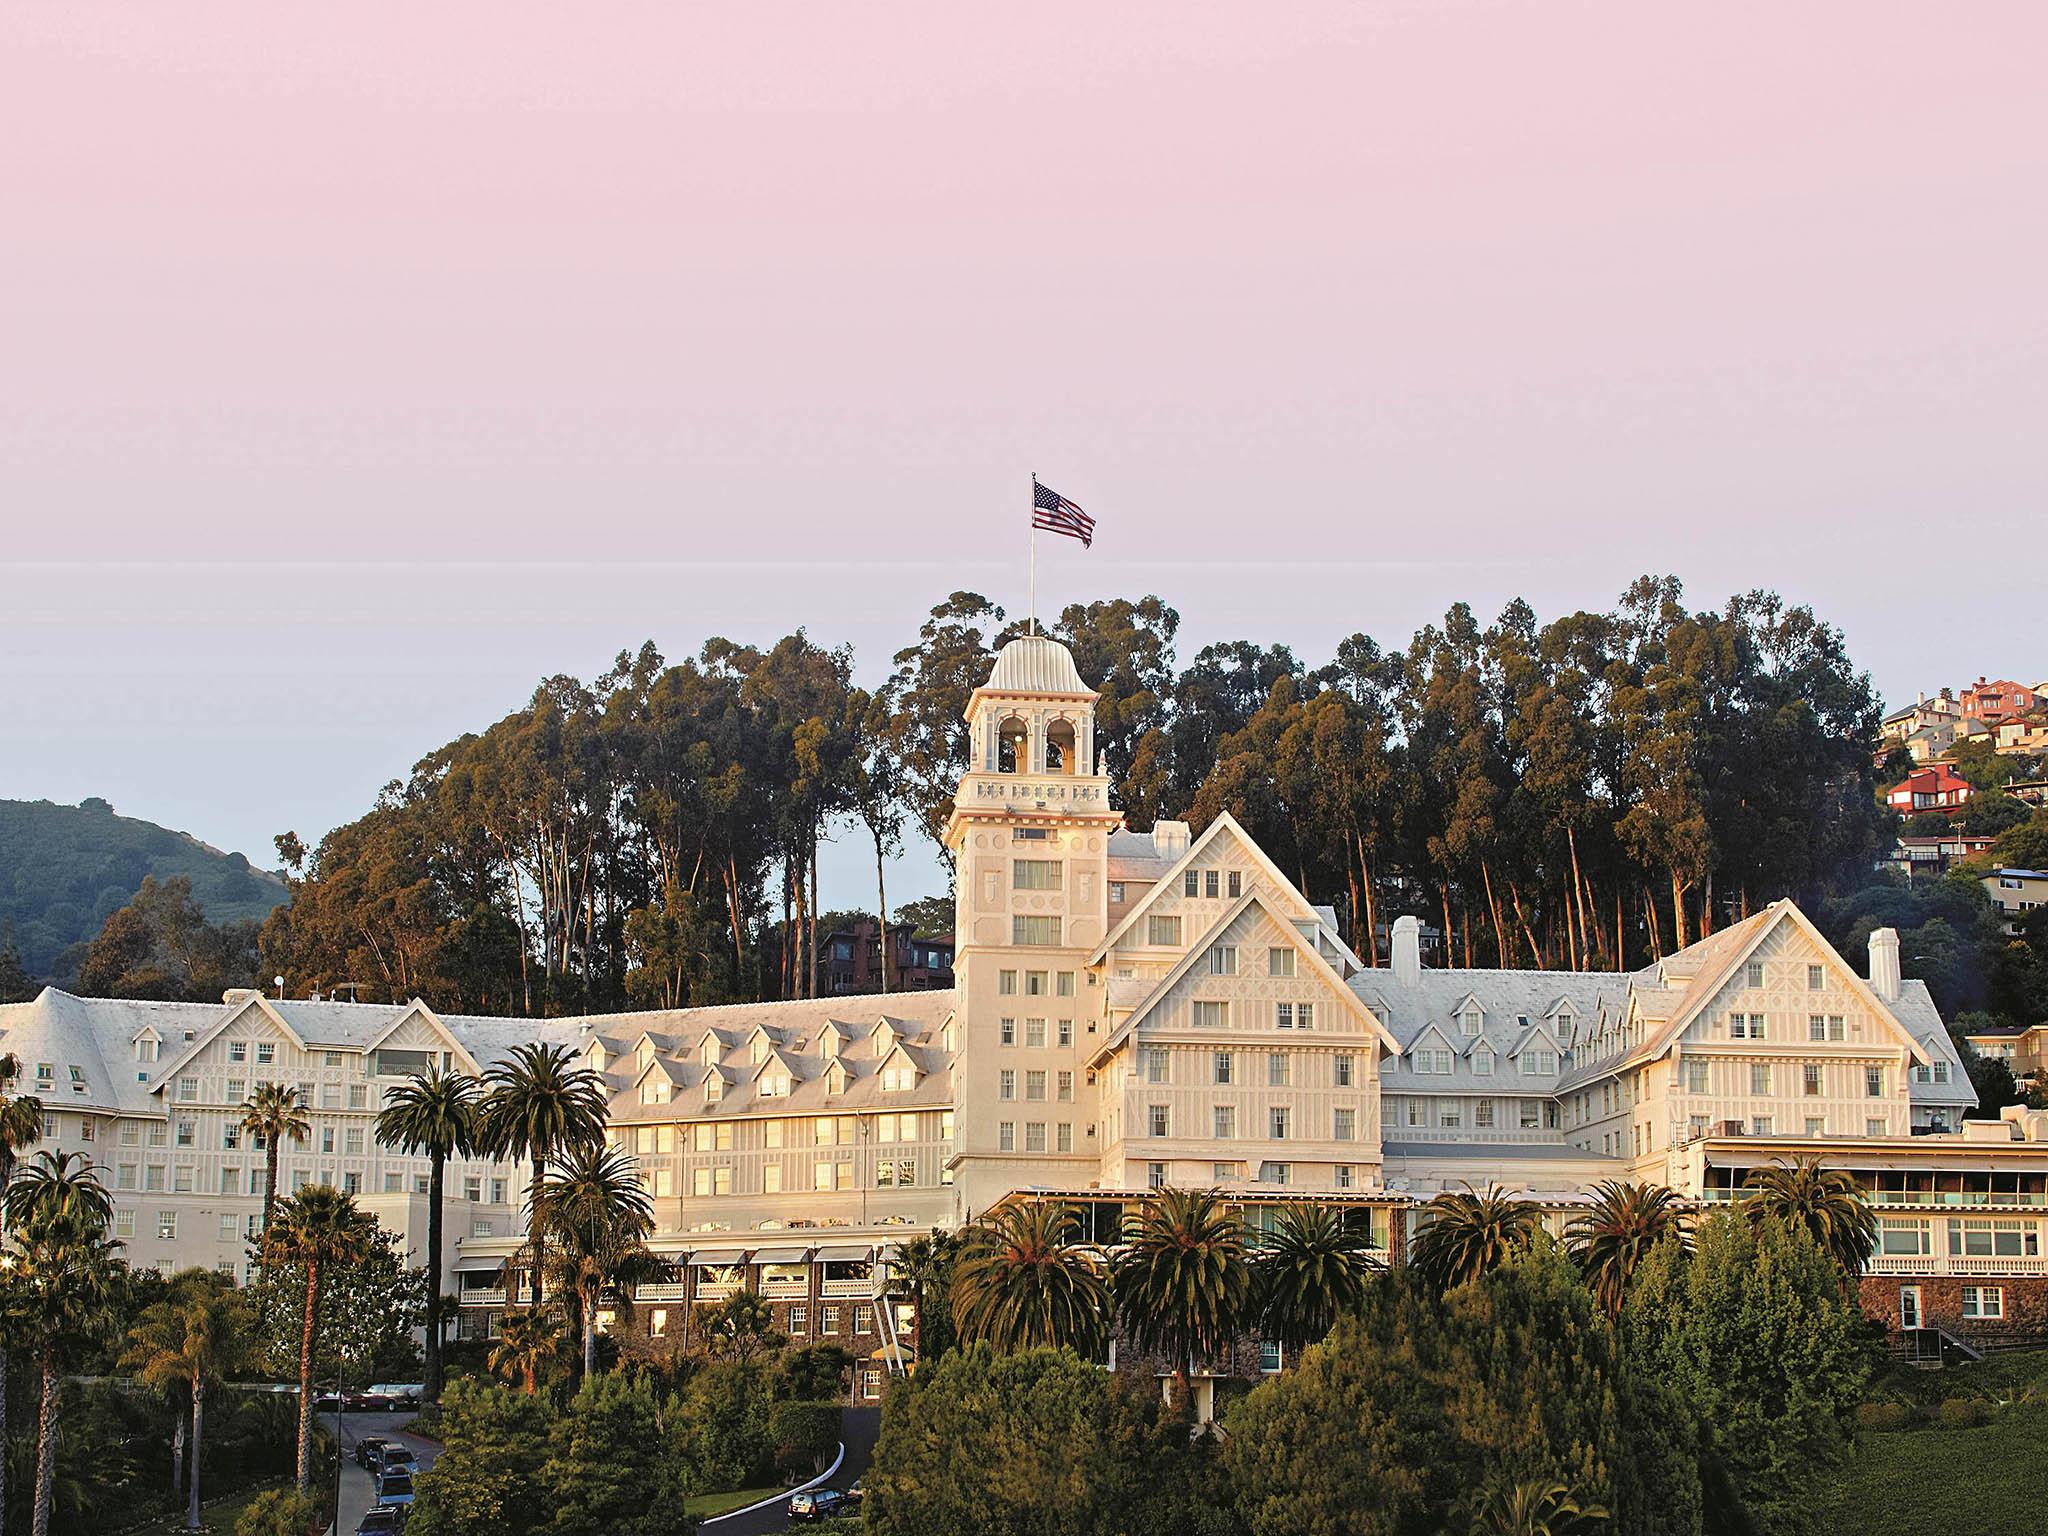 Hotel – Claremont Club & Spa - A Fairmont Hotel